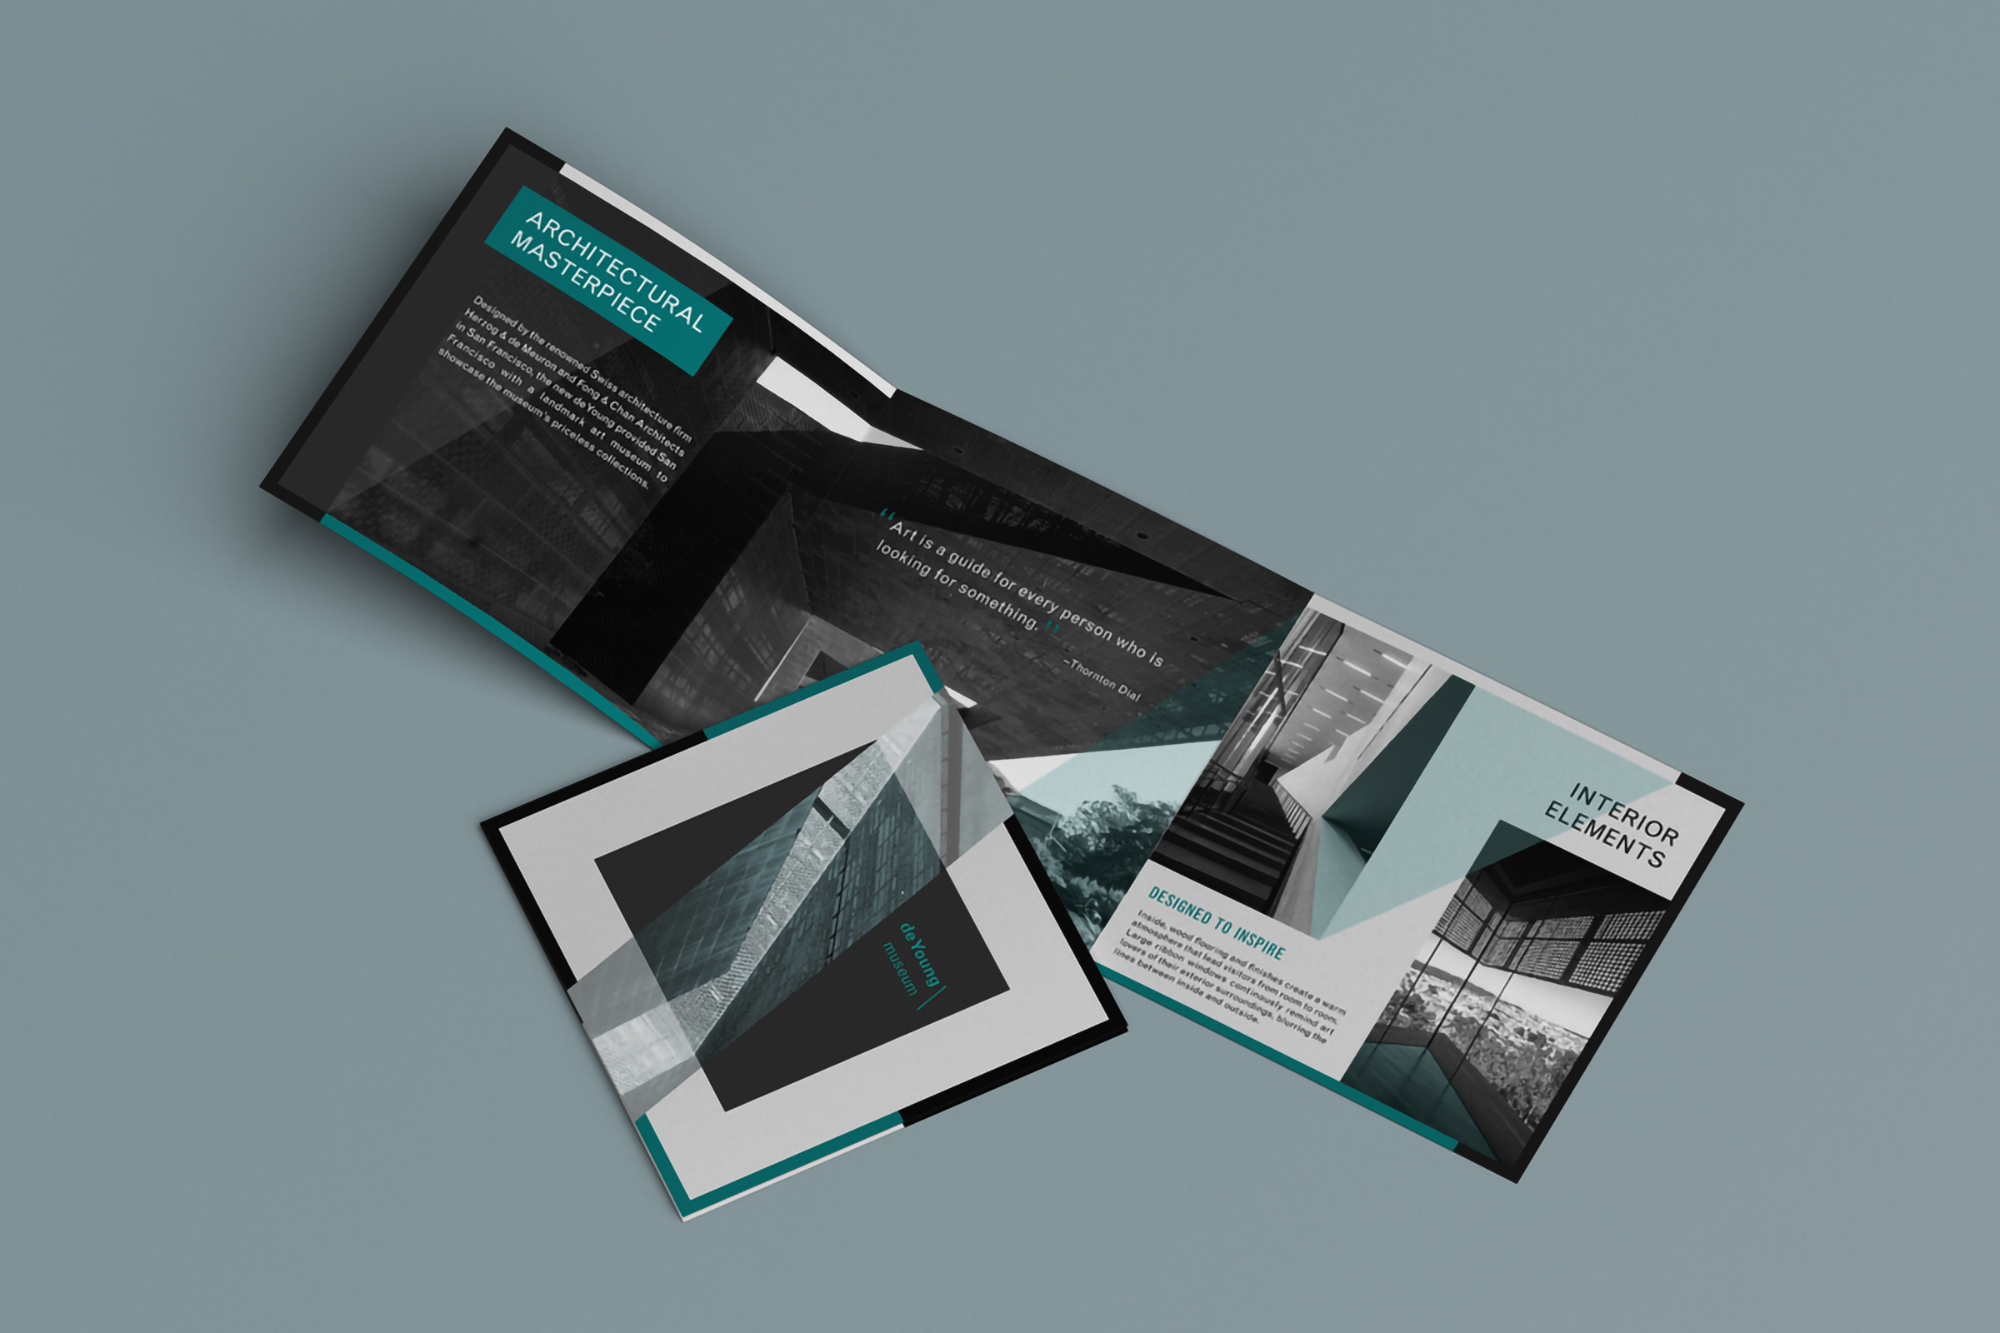 De Young Museum Architectural Brochure